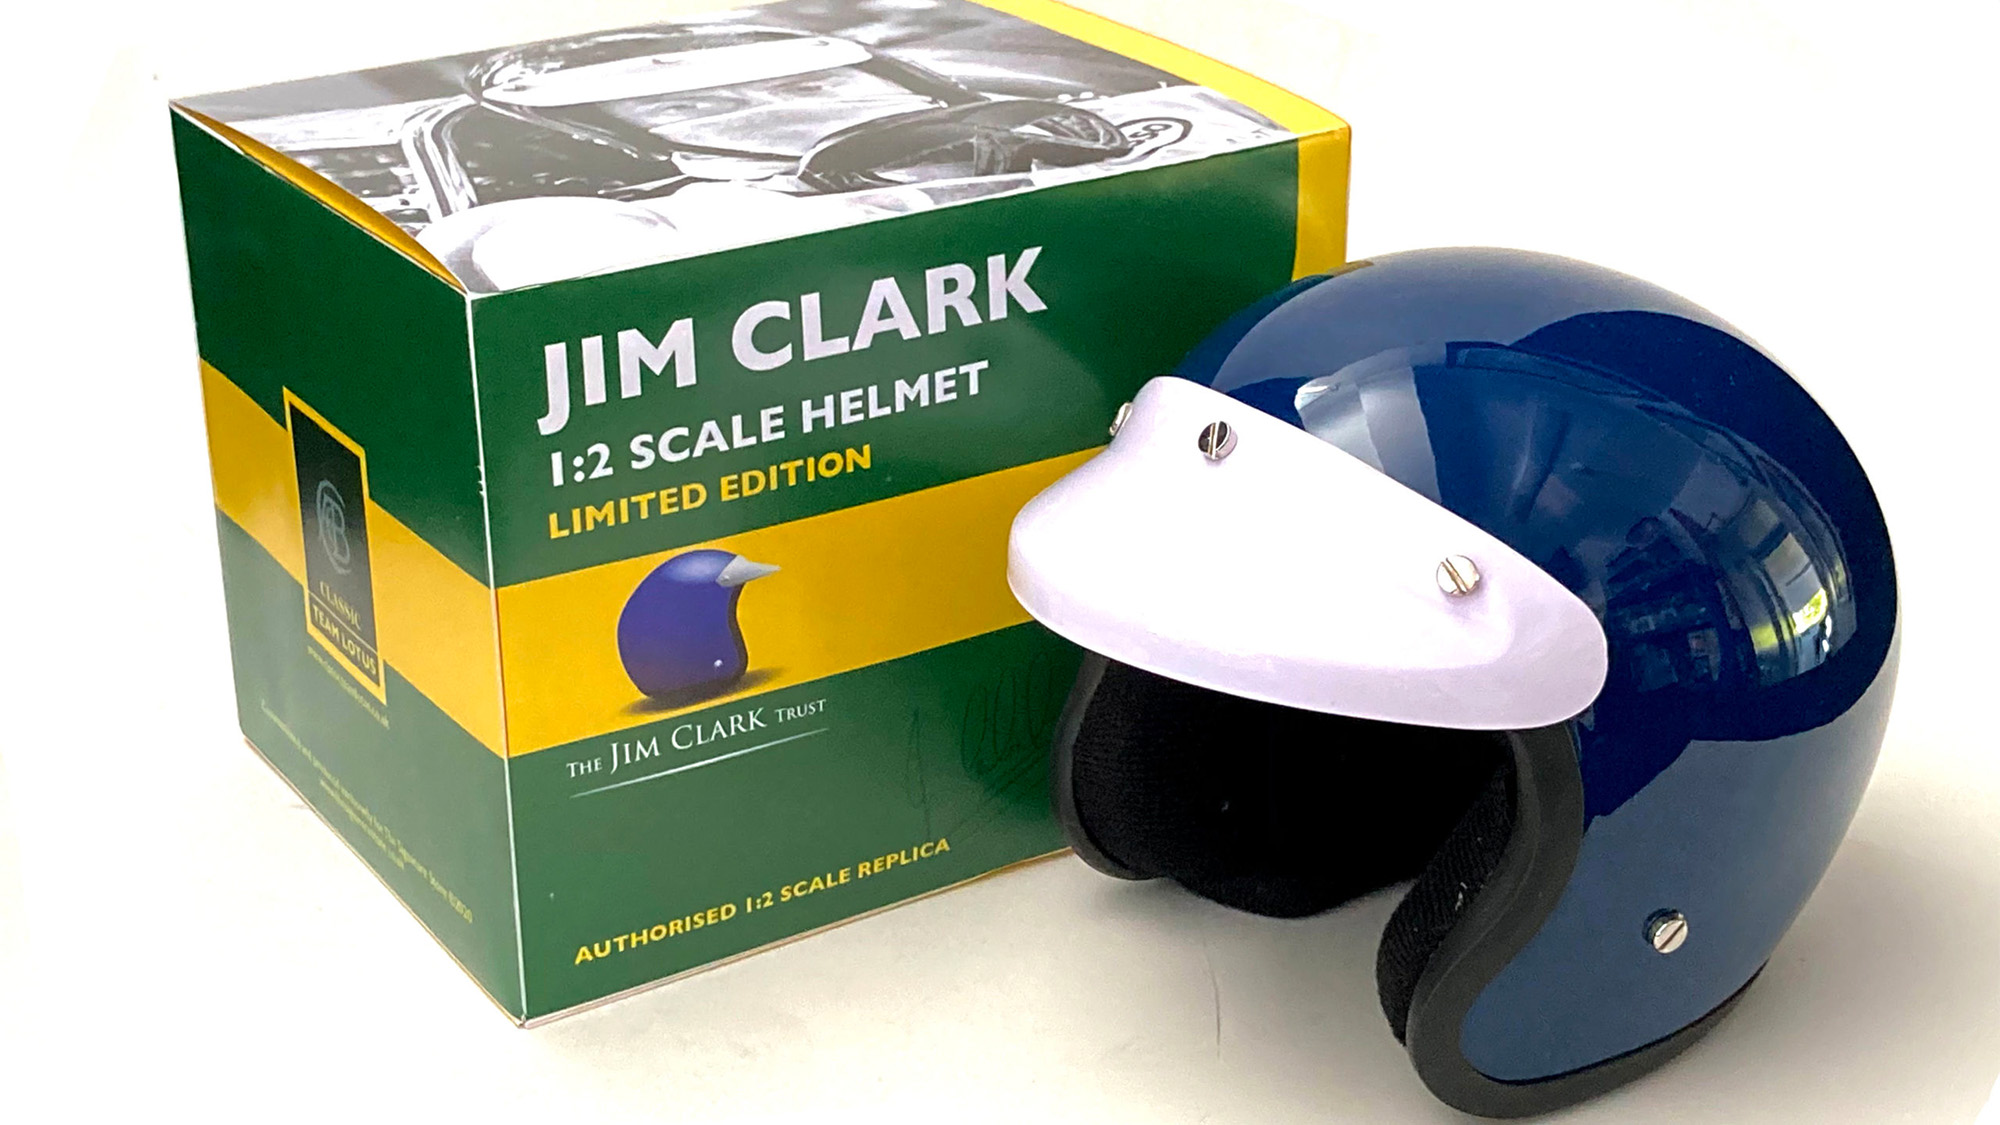 Jim Clark replica helmet